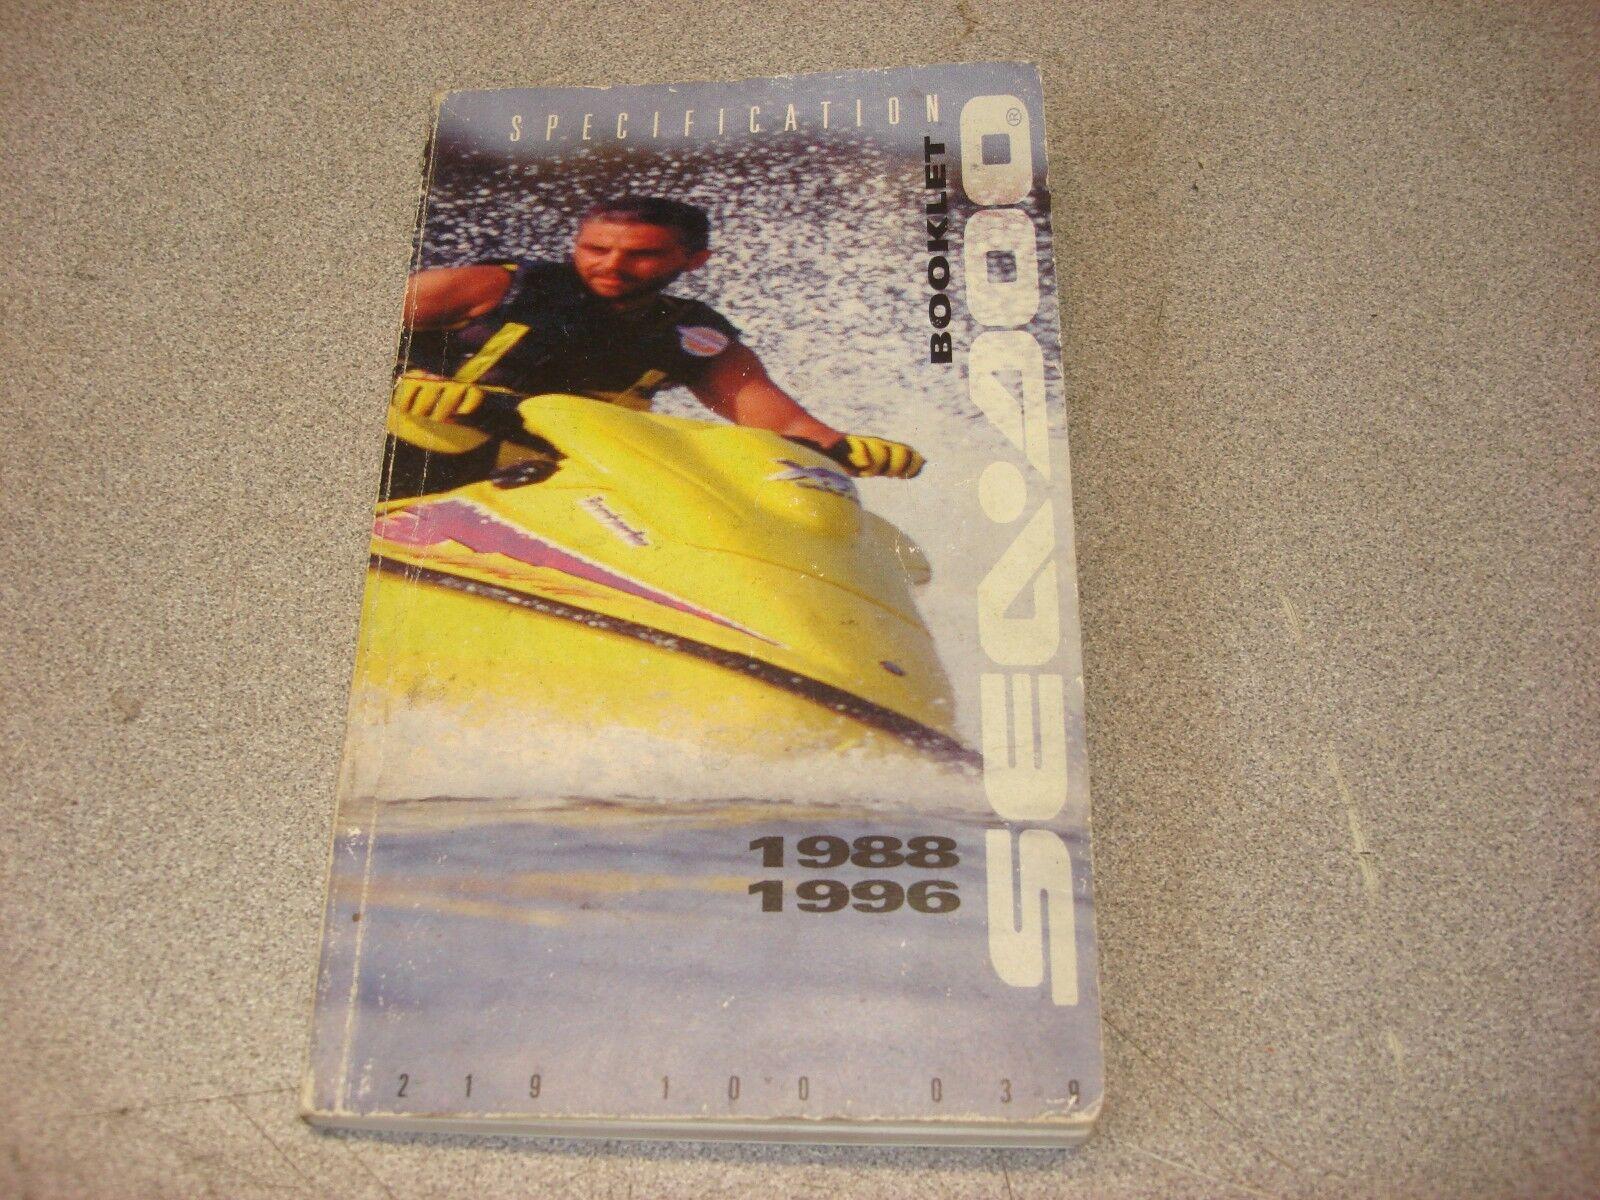 SEA DOO OEM SPEC MANUAL SP I X HX GT I X S GSX 1988-1996 SPECIFICATION SERVICE